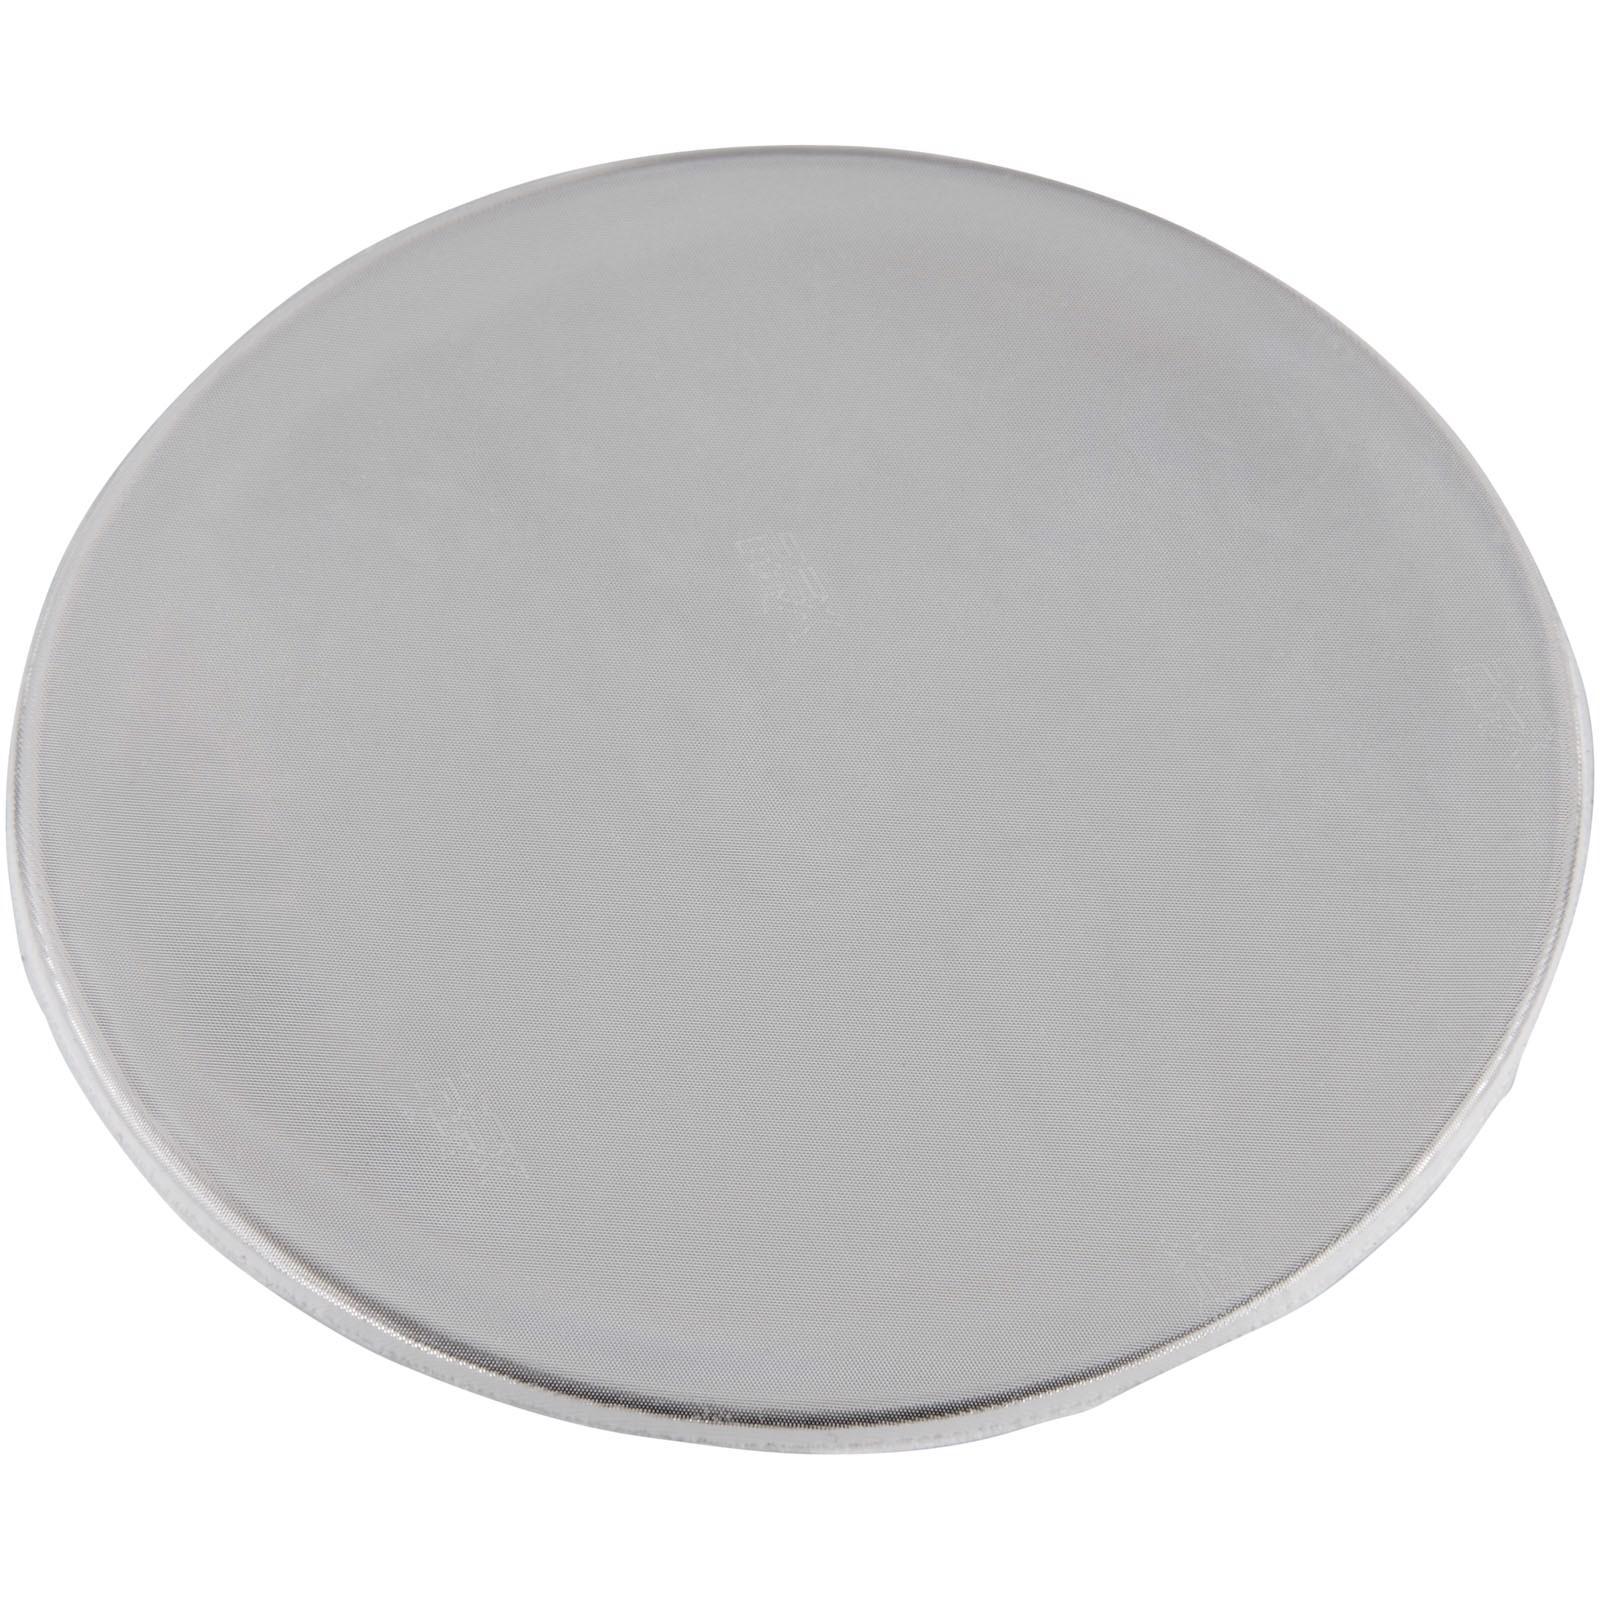 Reflective sticker round large - White